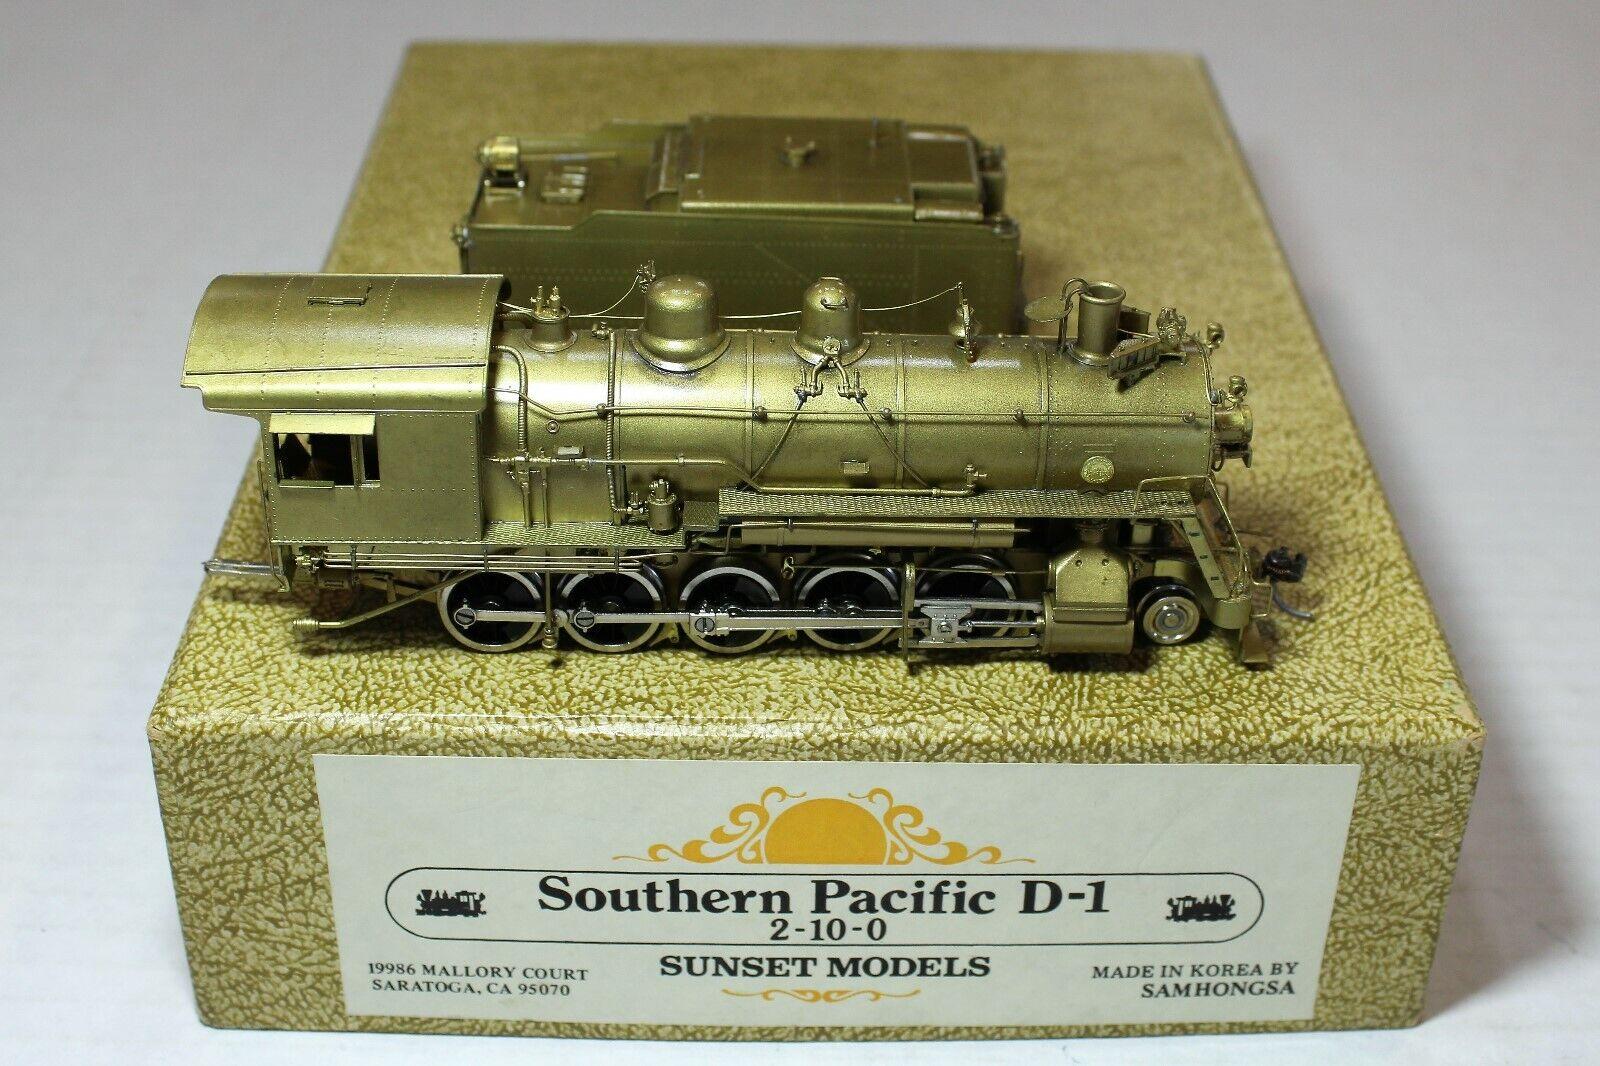 Sunset Modelos de latón Escala Ho Southern Pacific SP 2-10-0 D-1 Locomotora de vapor